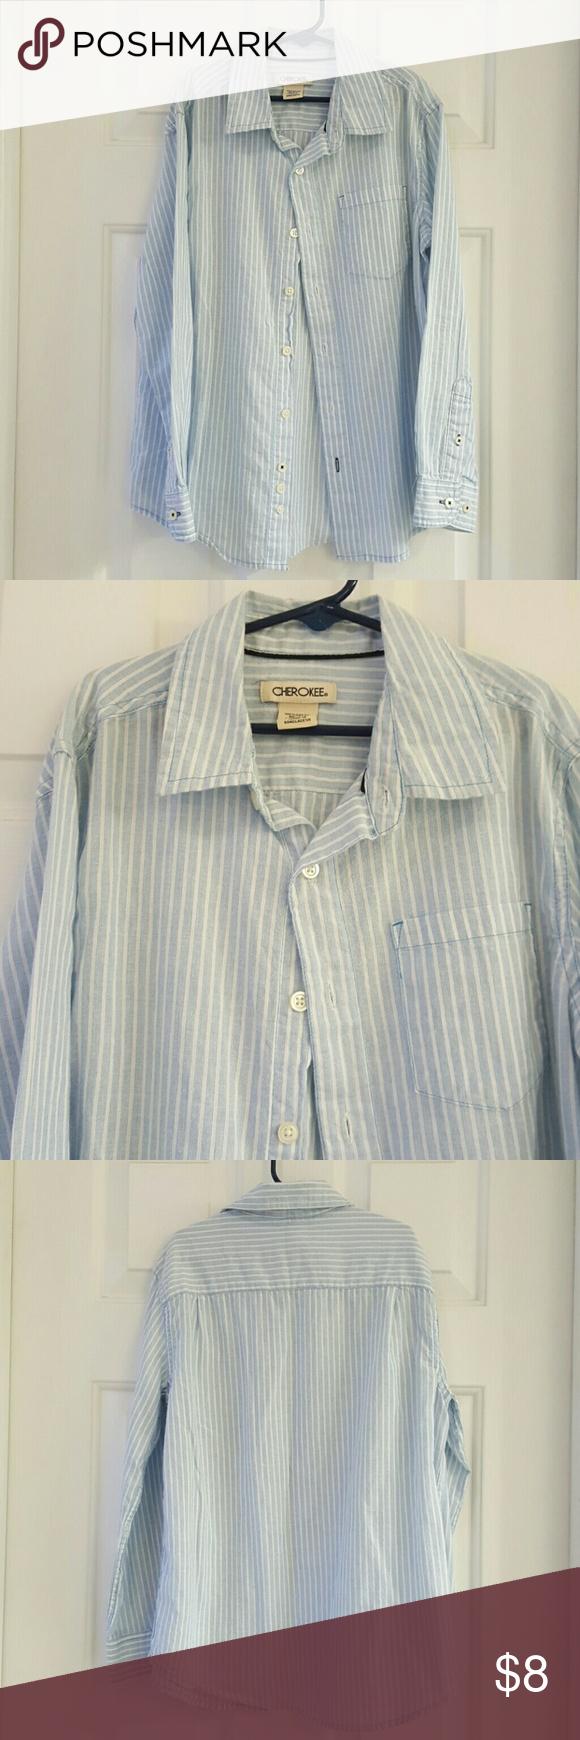 Cherokee Boys Striped Button Up Shirt Cherokee Boys Striped Button Up Shirt. One front pocket. Excellent condition. 100% Cotton. Boys Medium size 8-10. Cherokee Shirts & Tops Button Down Shirts